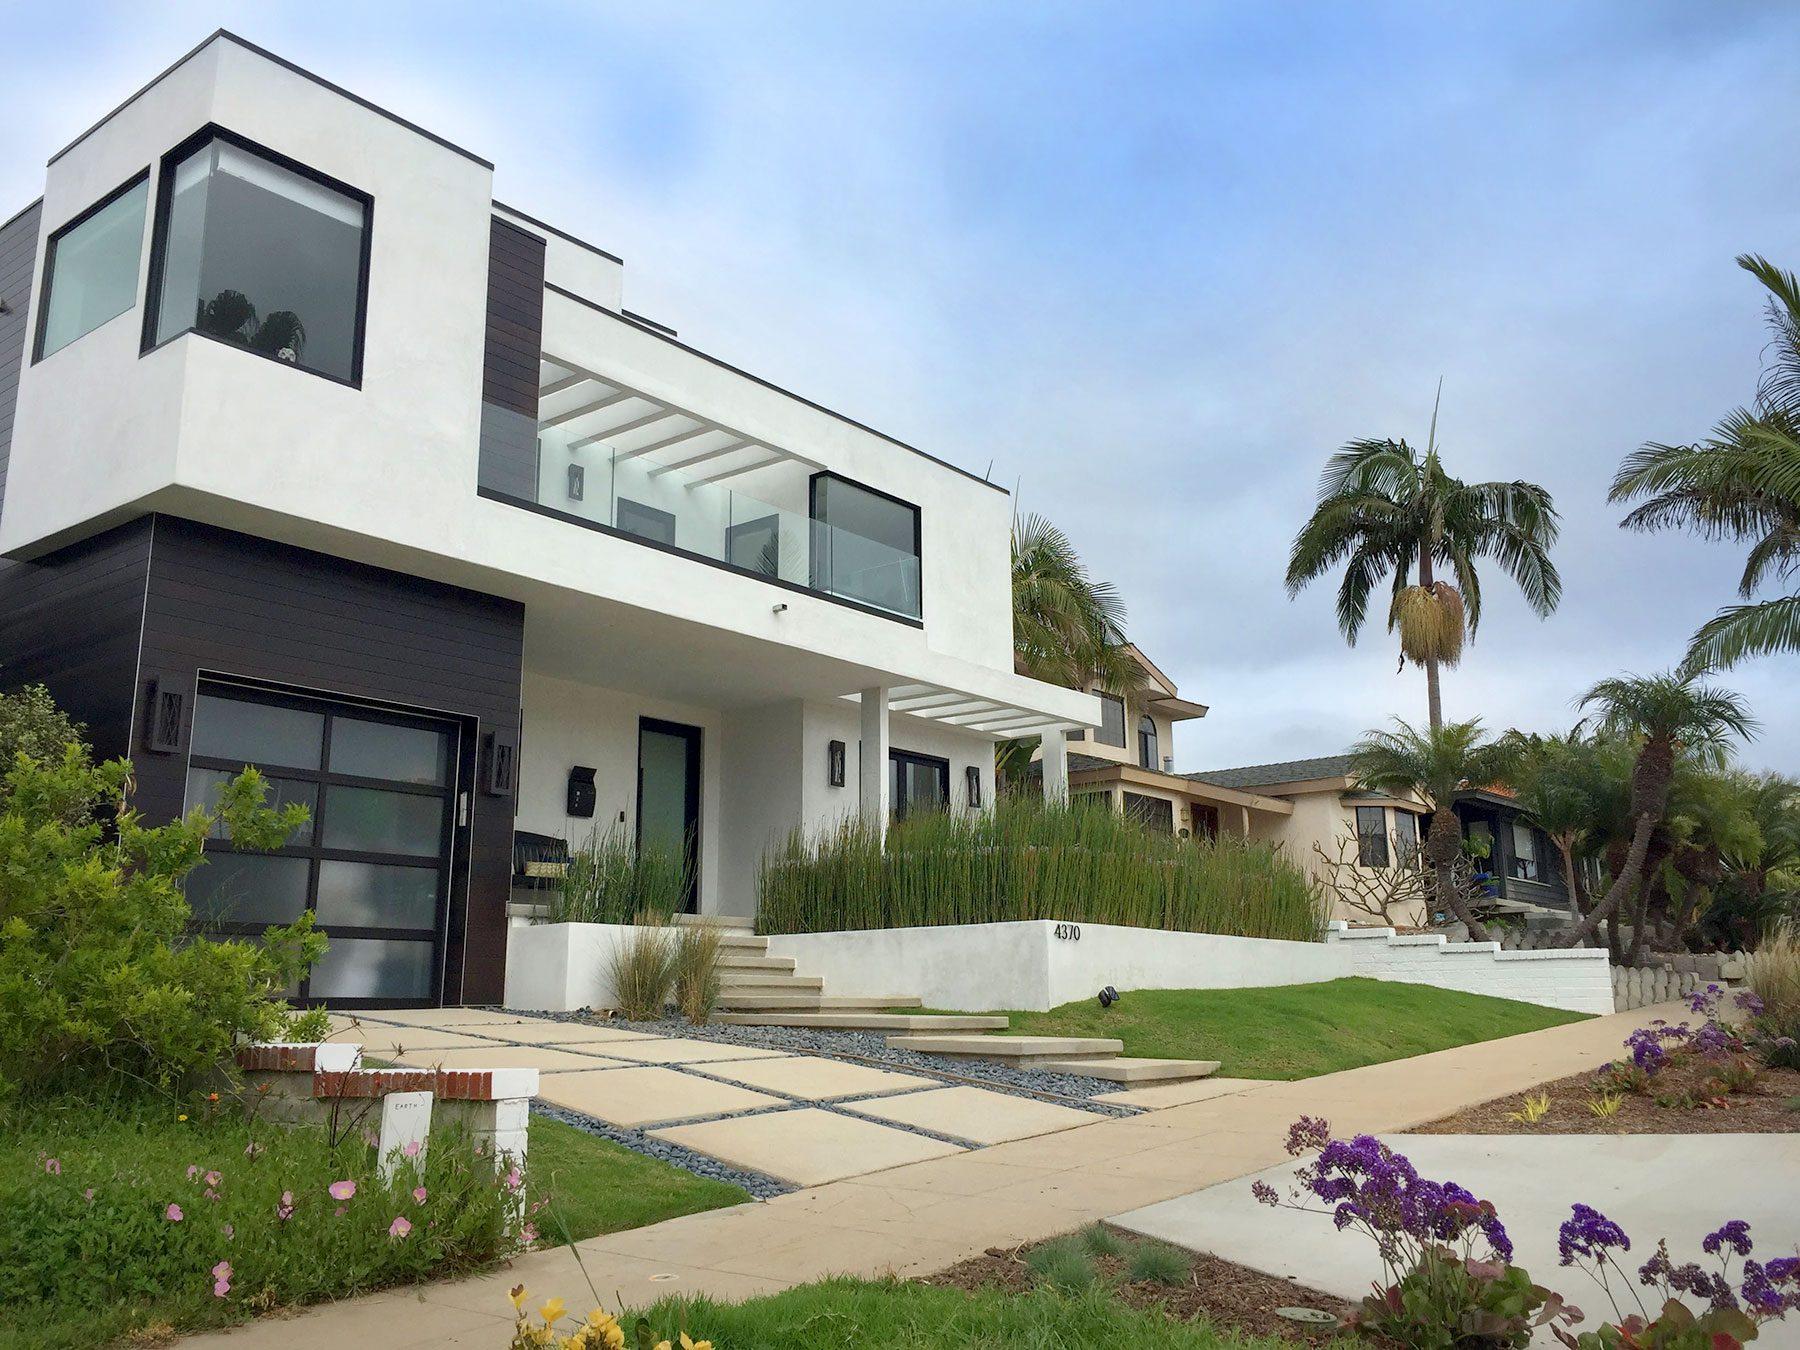 California County Conforming Loan Limits